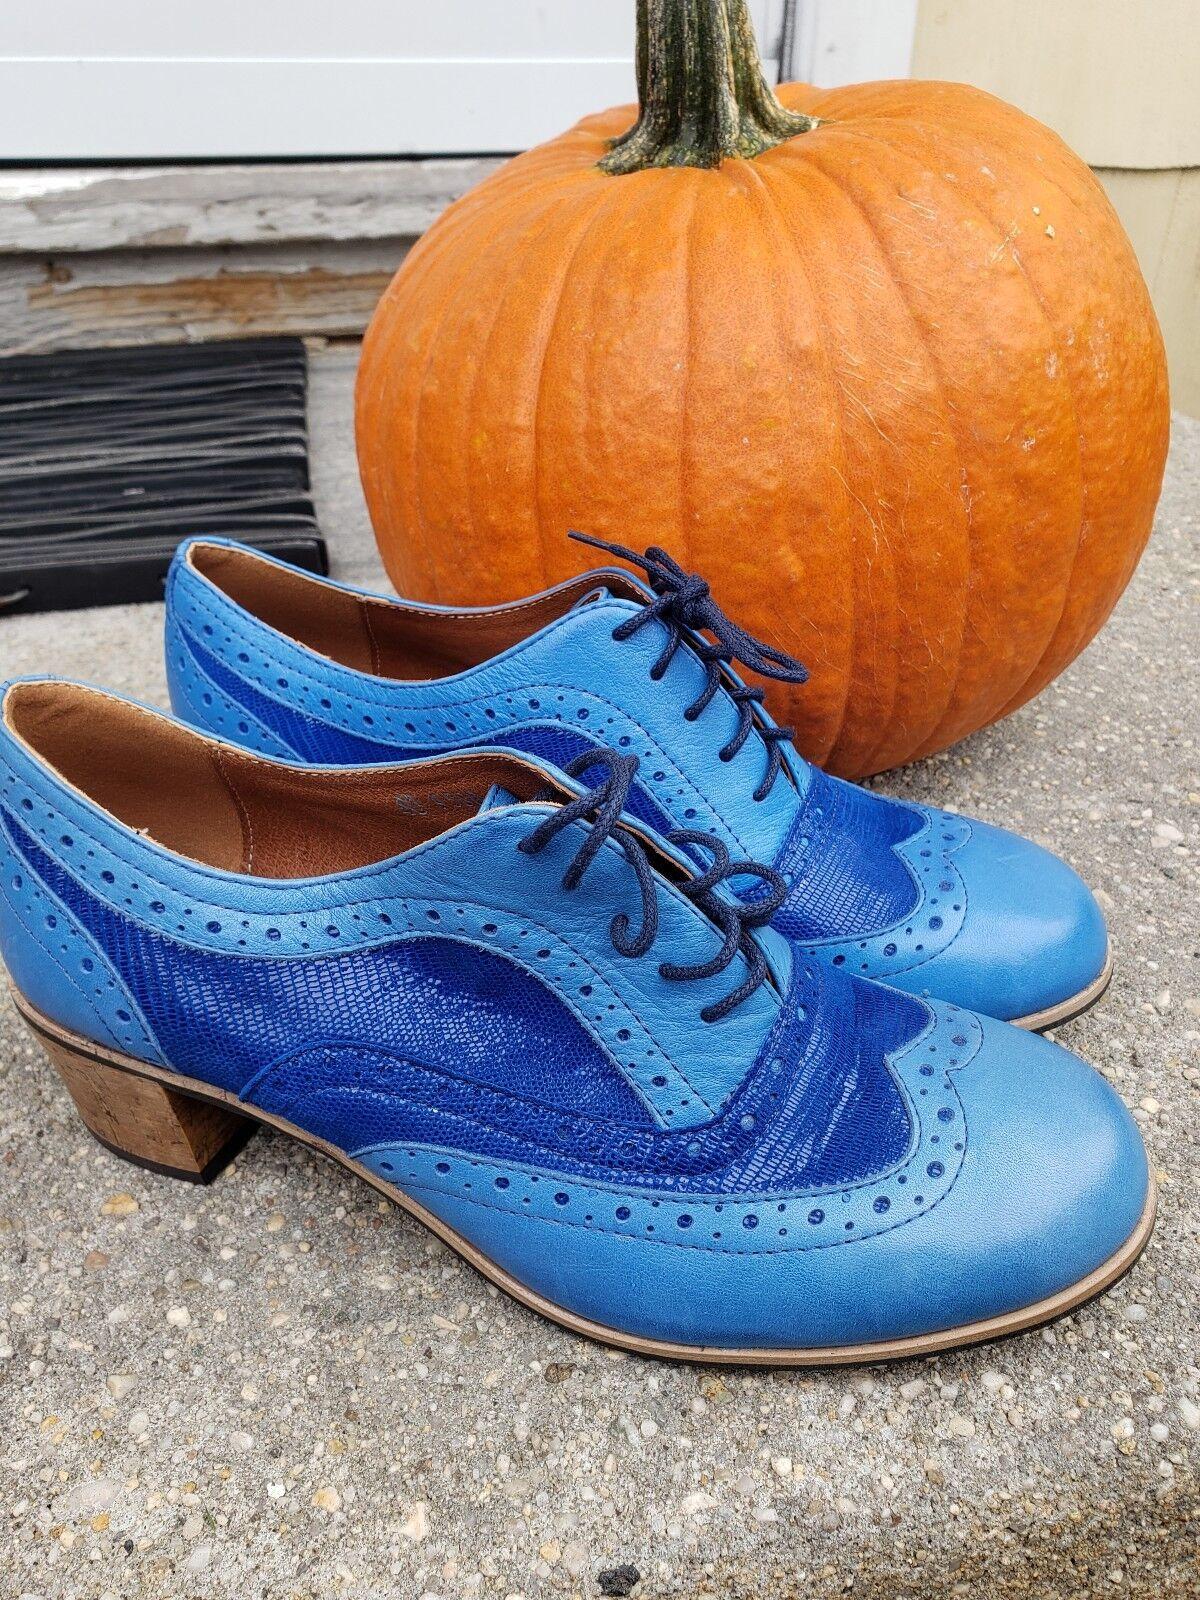 RARE RARE RARE Justin Reece 2-TONE Blau Leather matte lace up heel Stiefel damen SZ 40 auth 1c3719